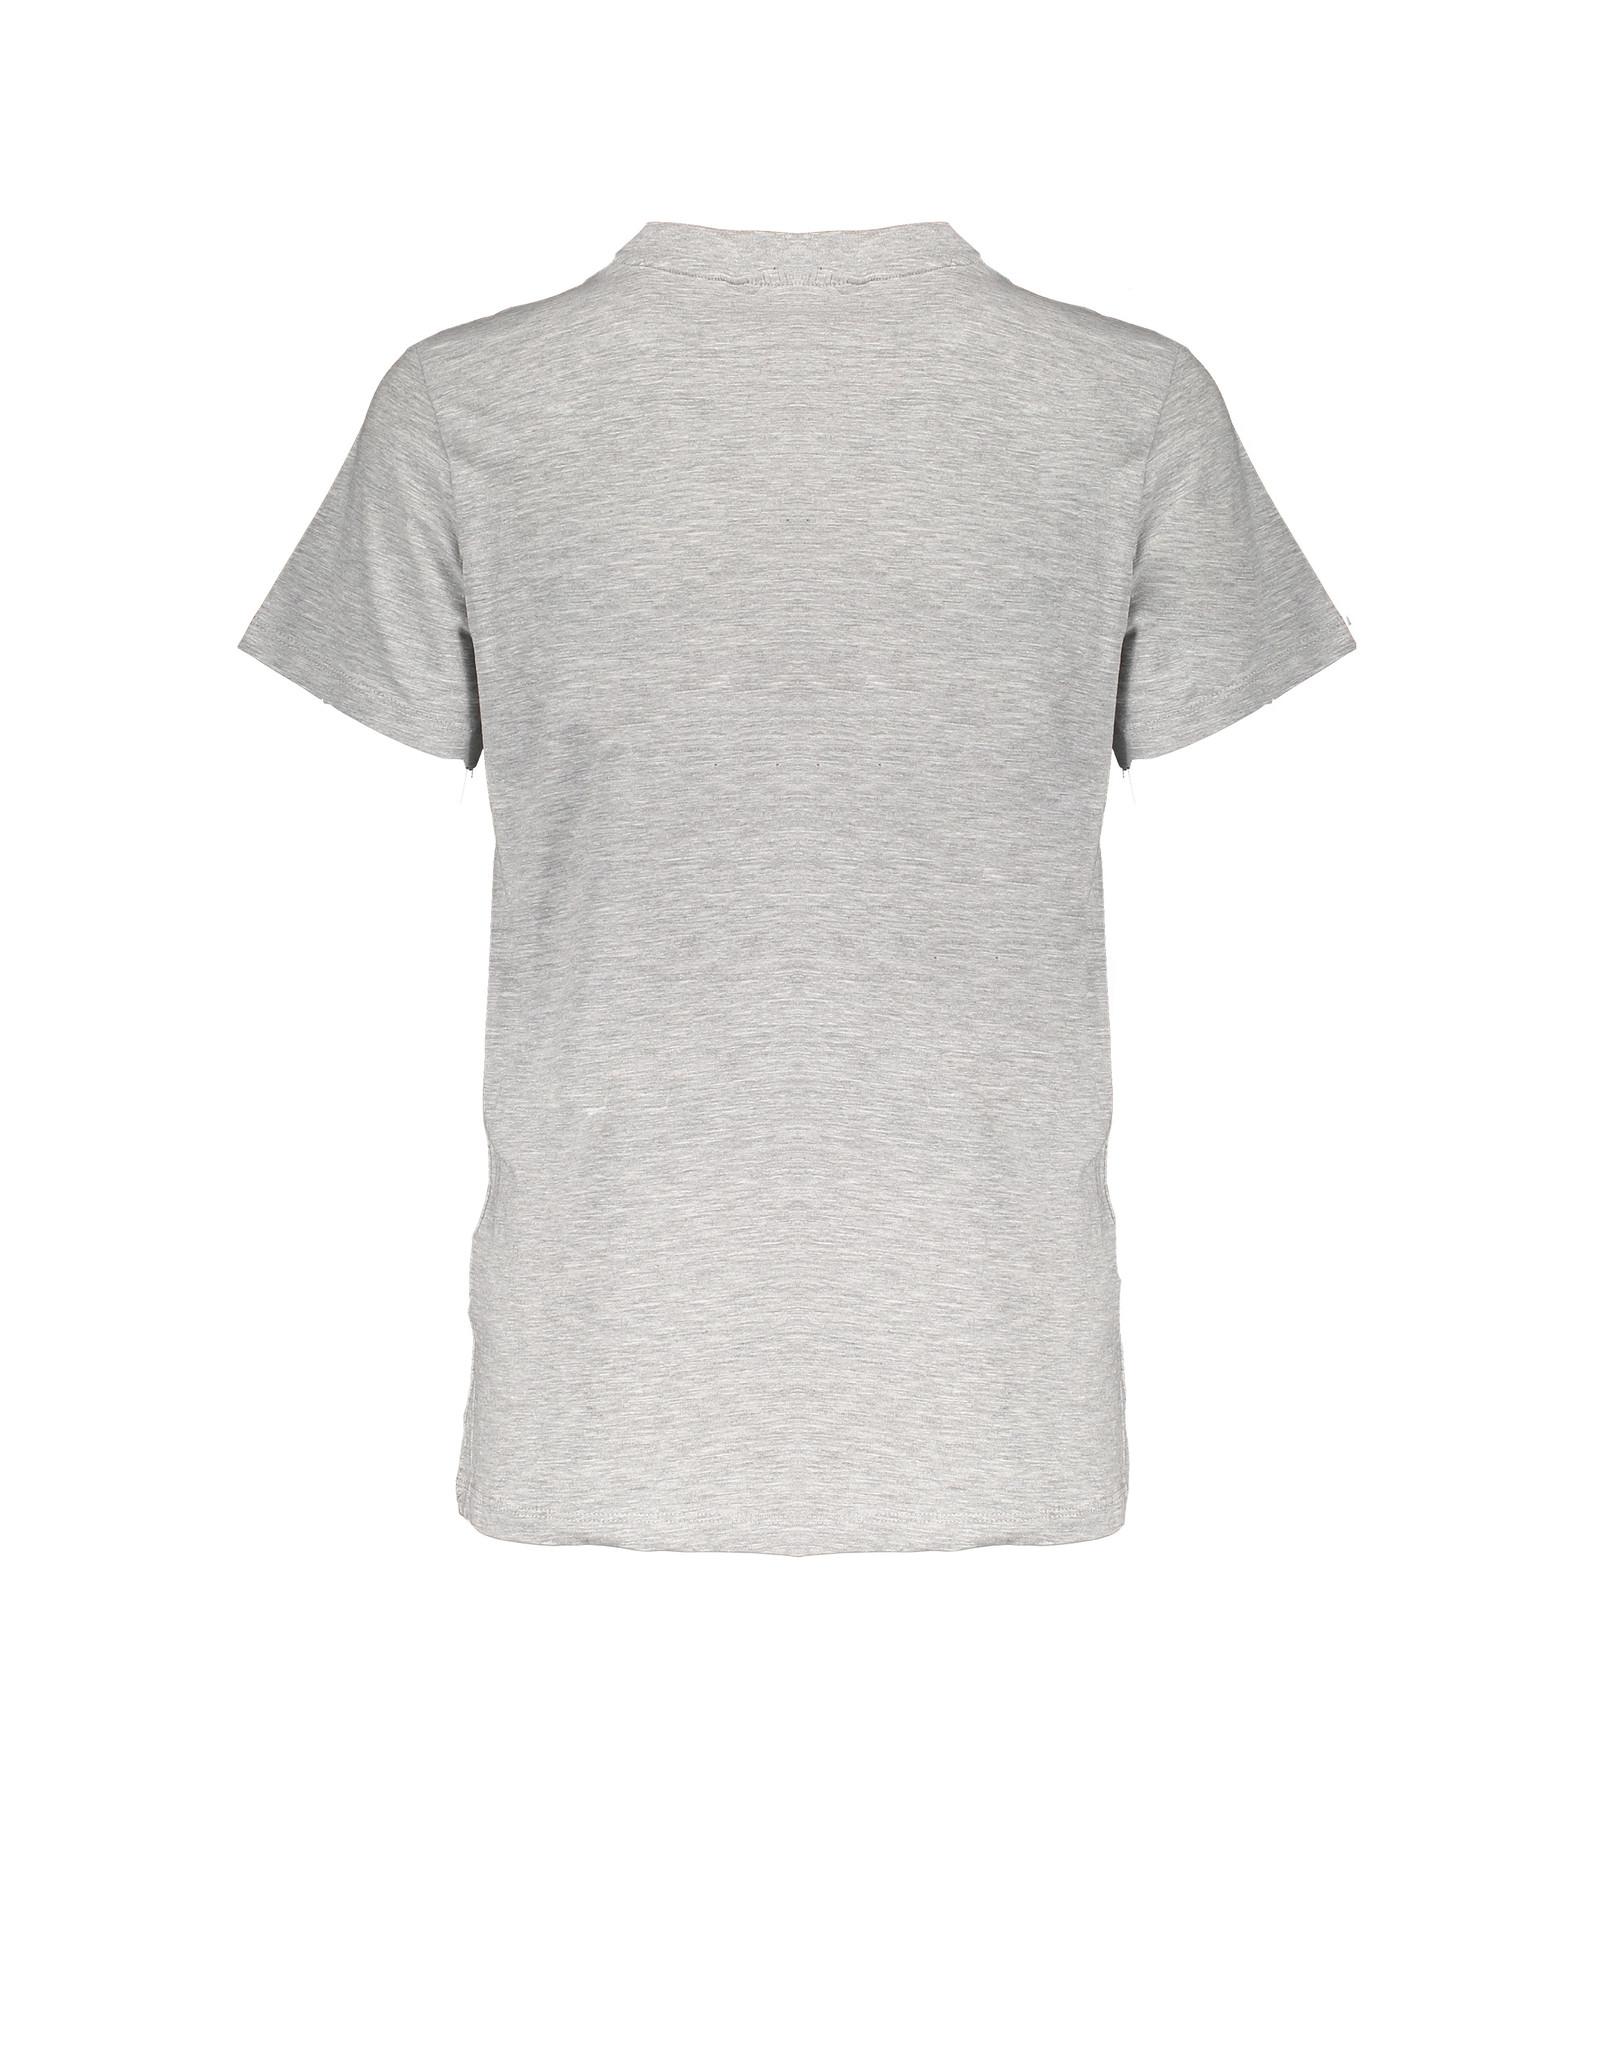 Bellaire Kurt shortsleeves T-shirt + KurtB LGM